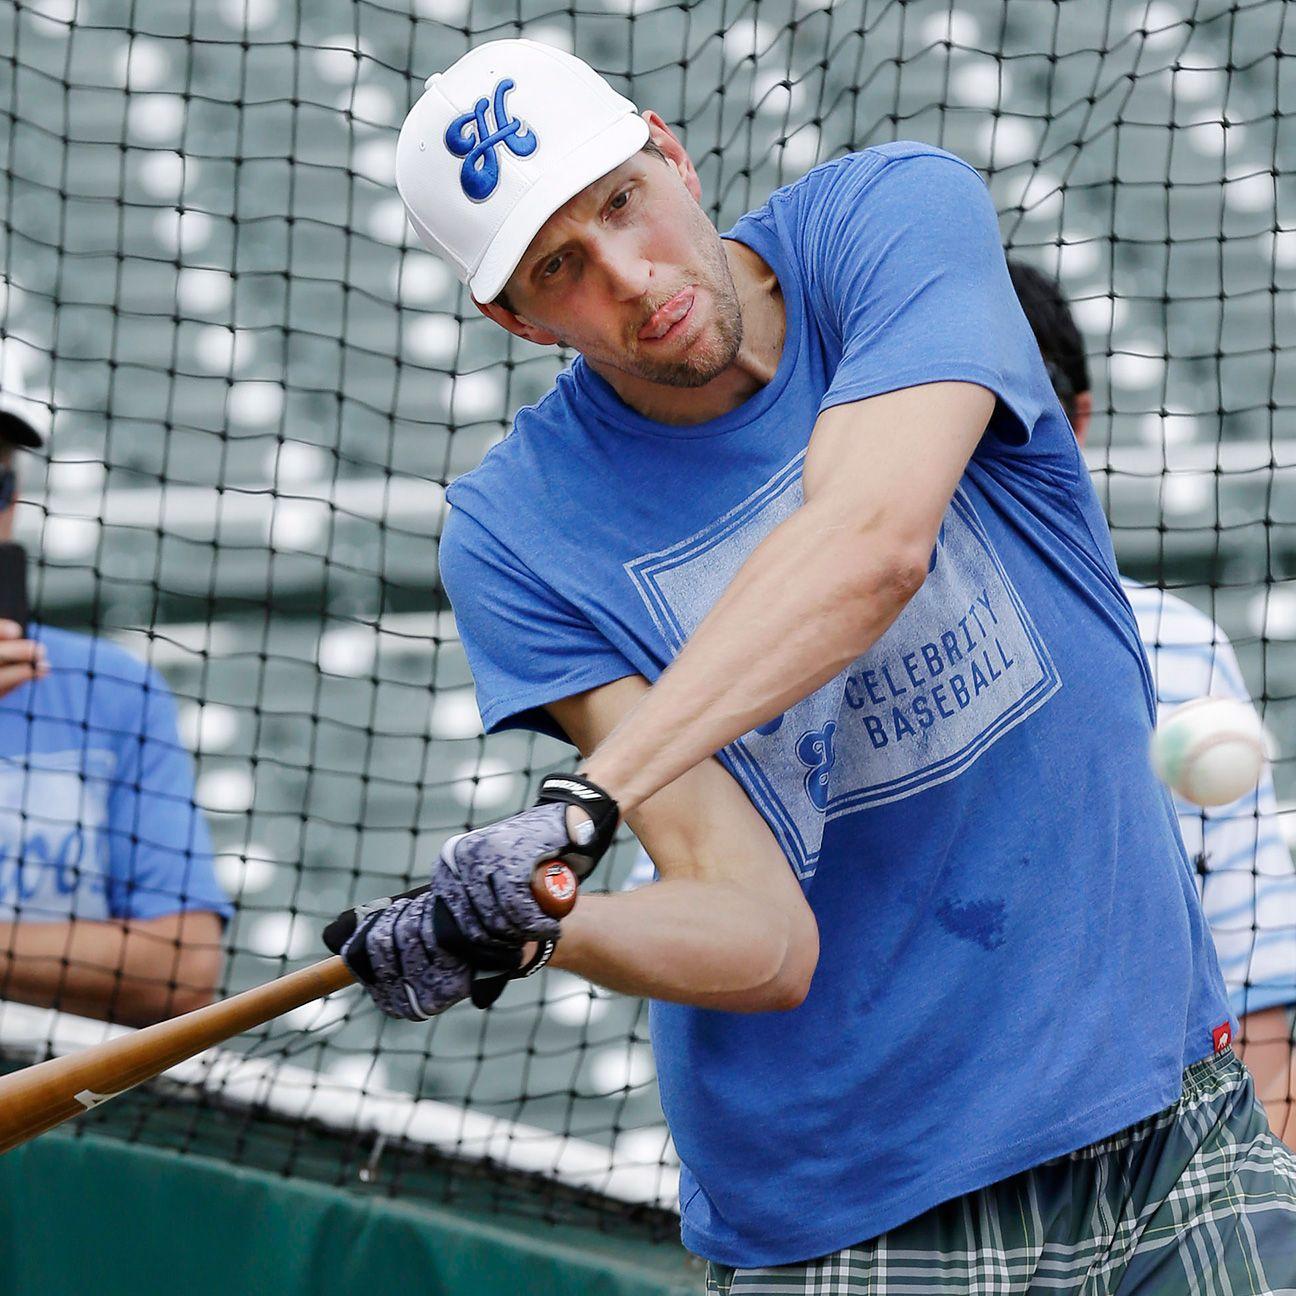 Dirk Nowitzki Heroes Celebrity Baseball Game Tickets ...